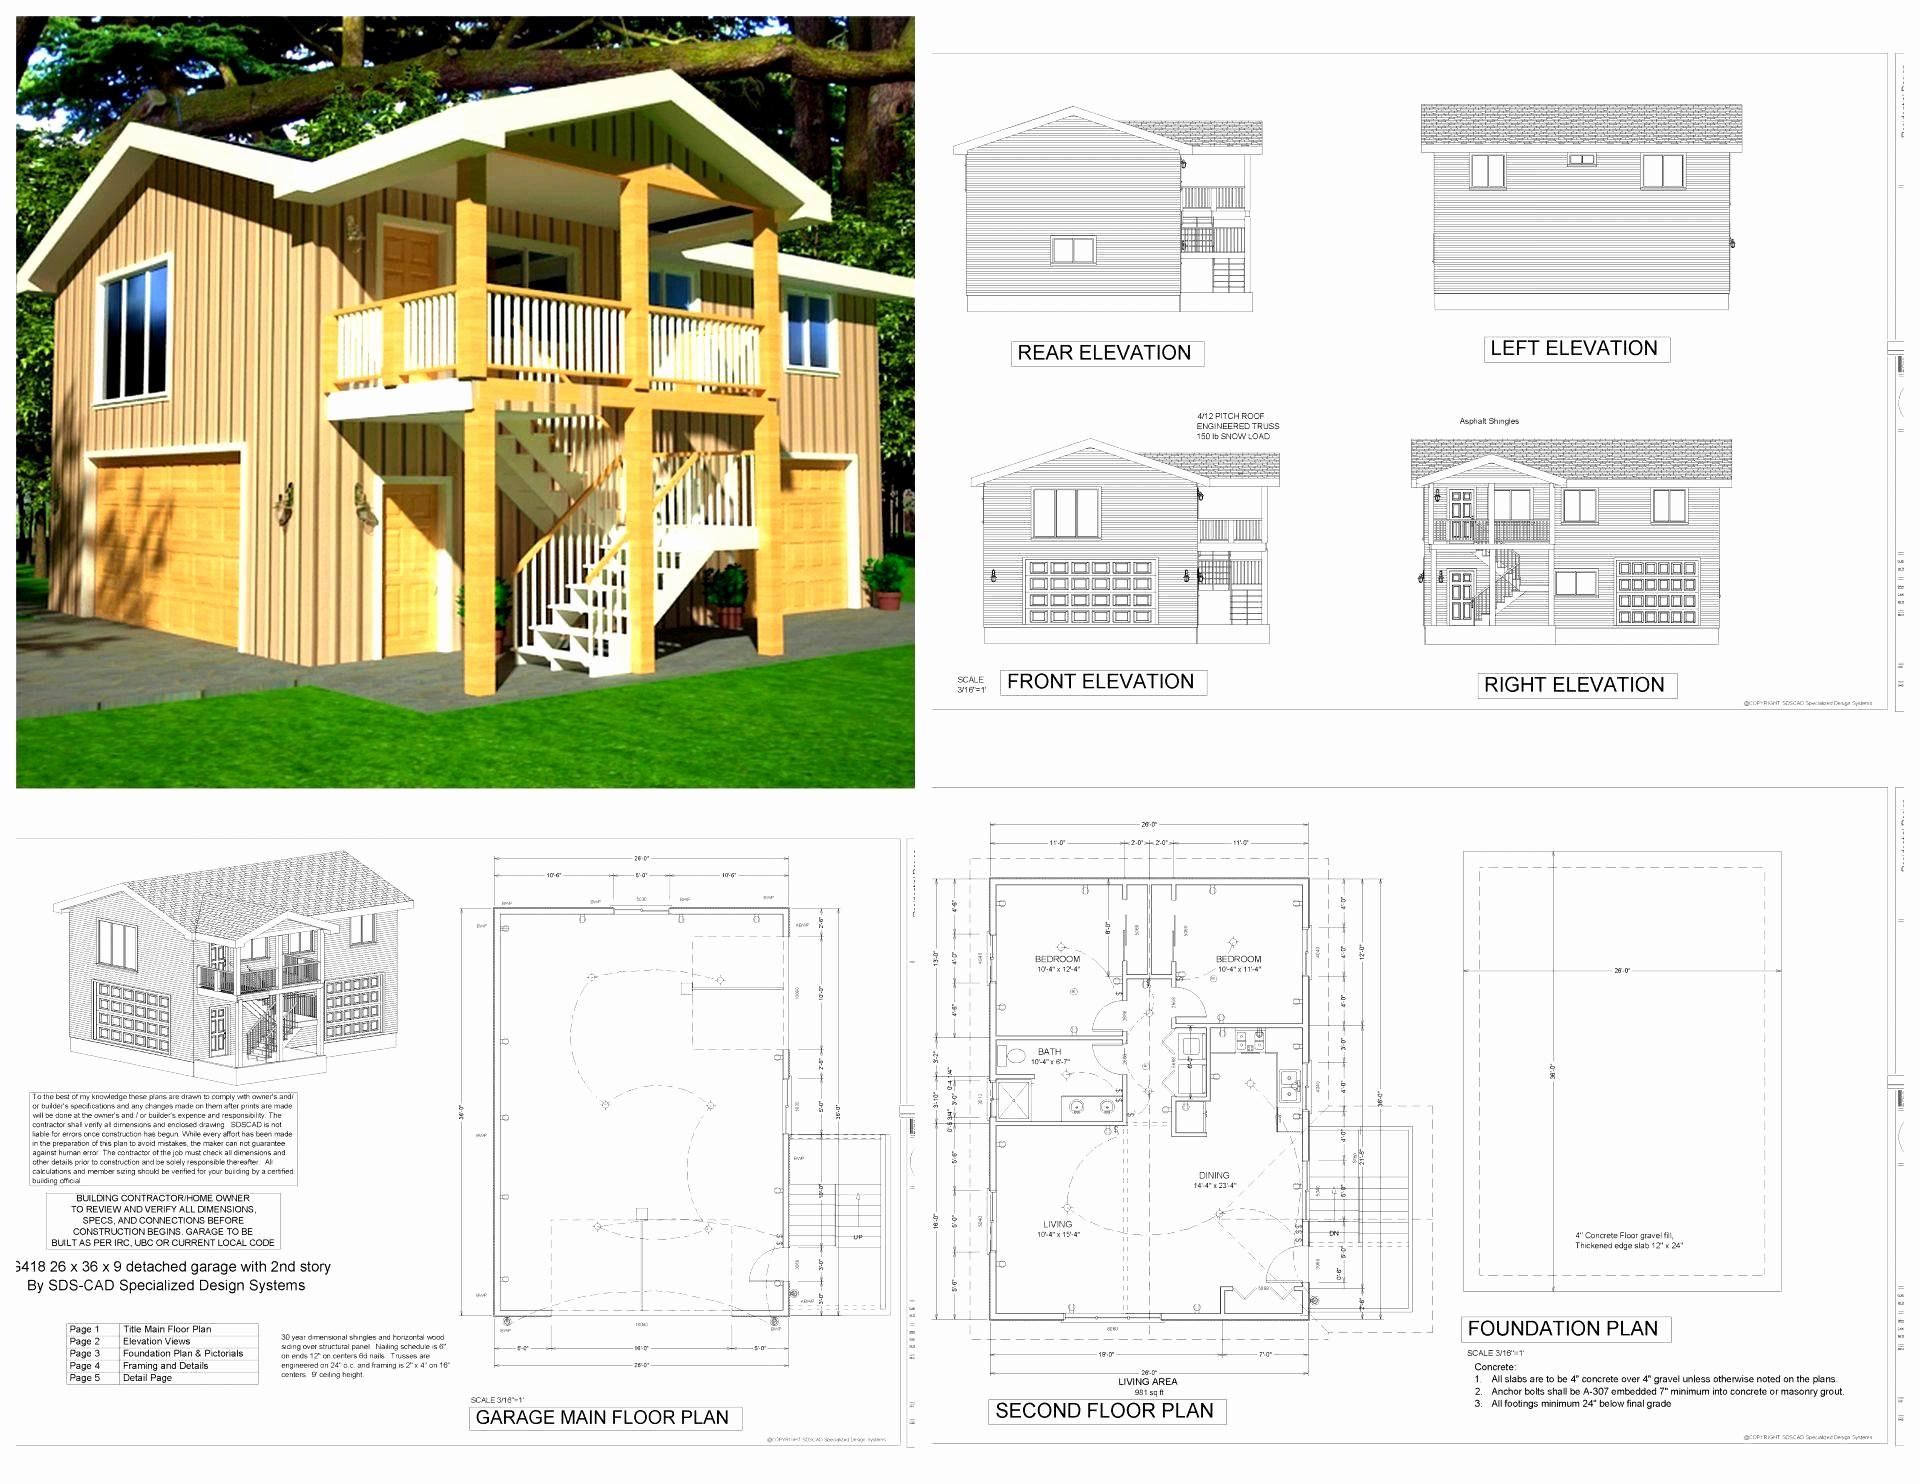 wood magazine plans garage layout ideas awesome master bedroom over garage addition of wood magazine plans